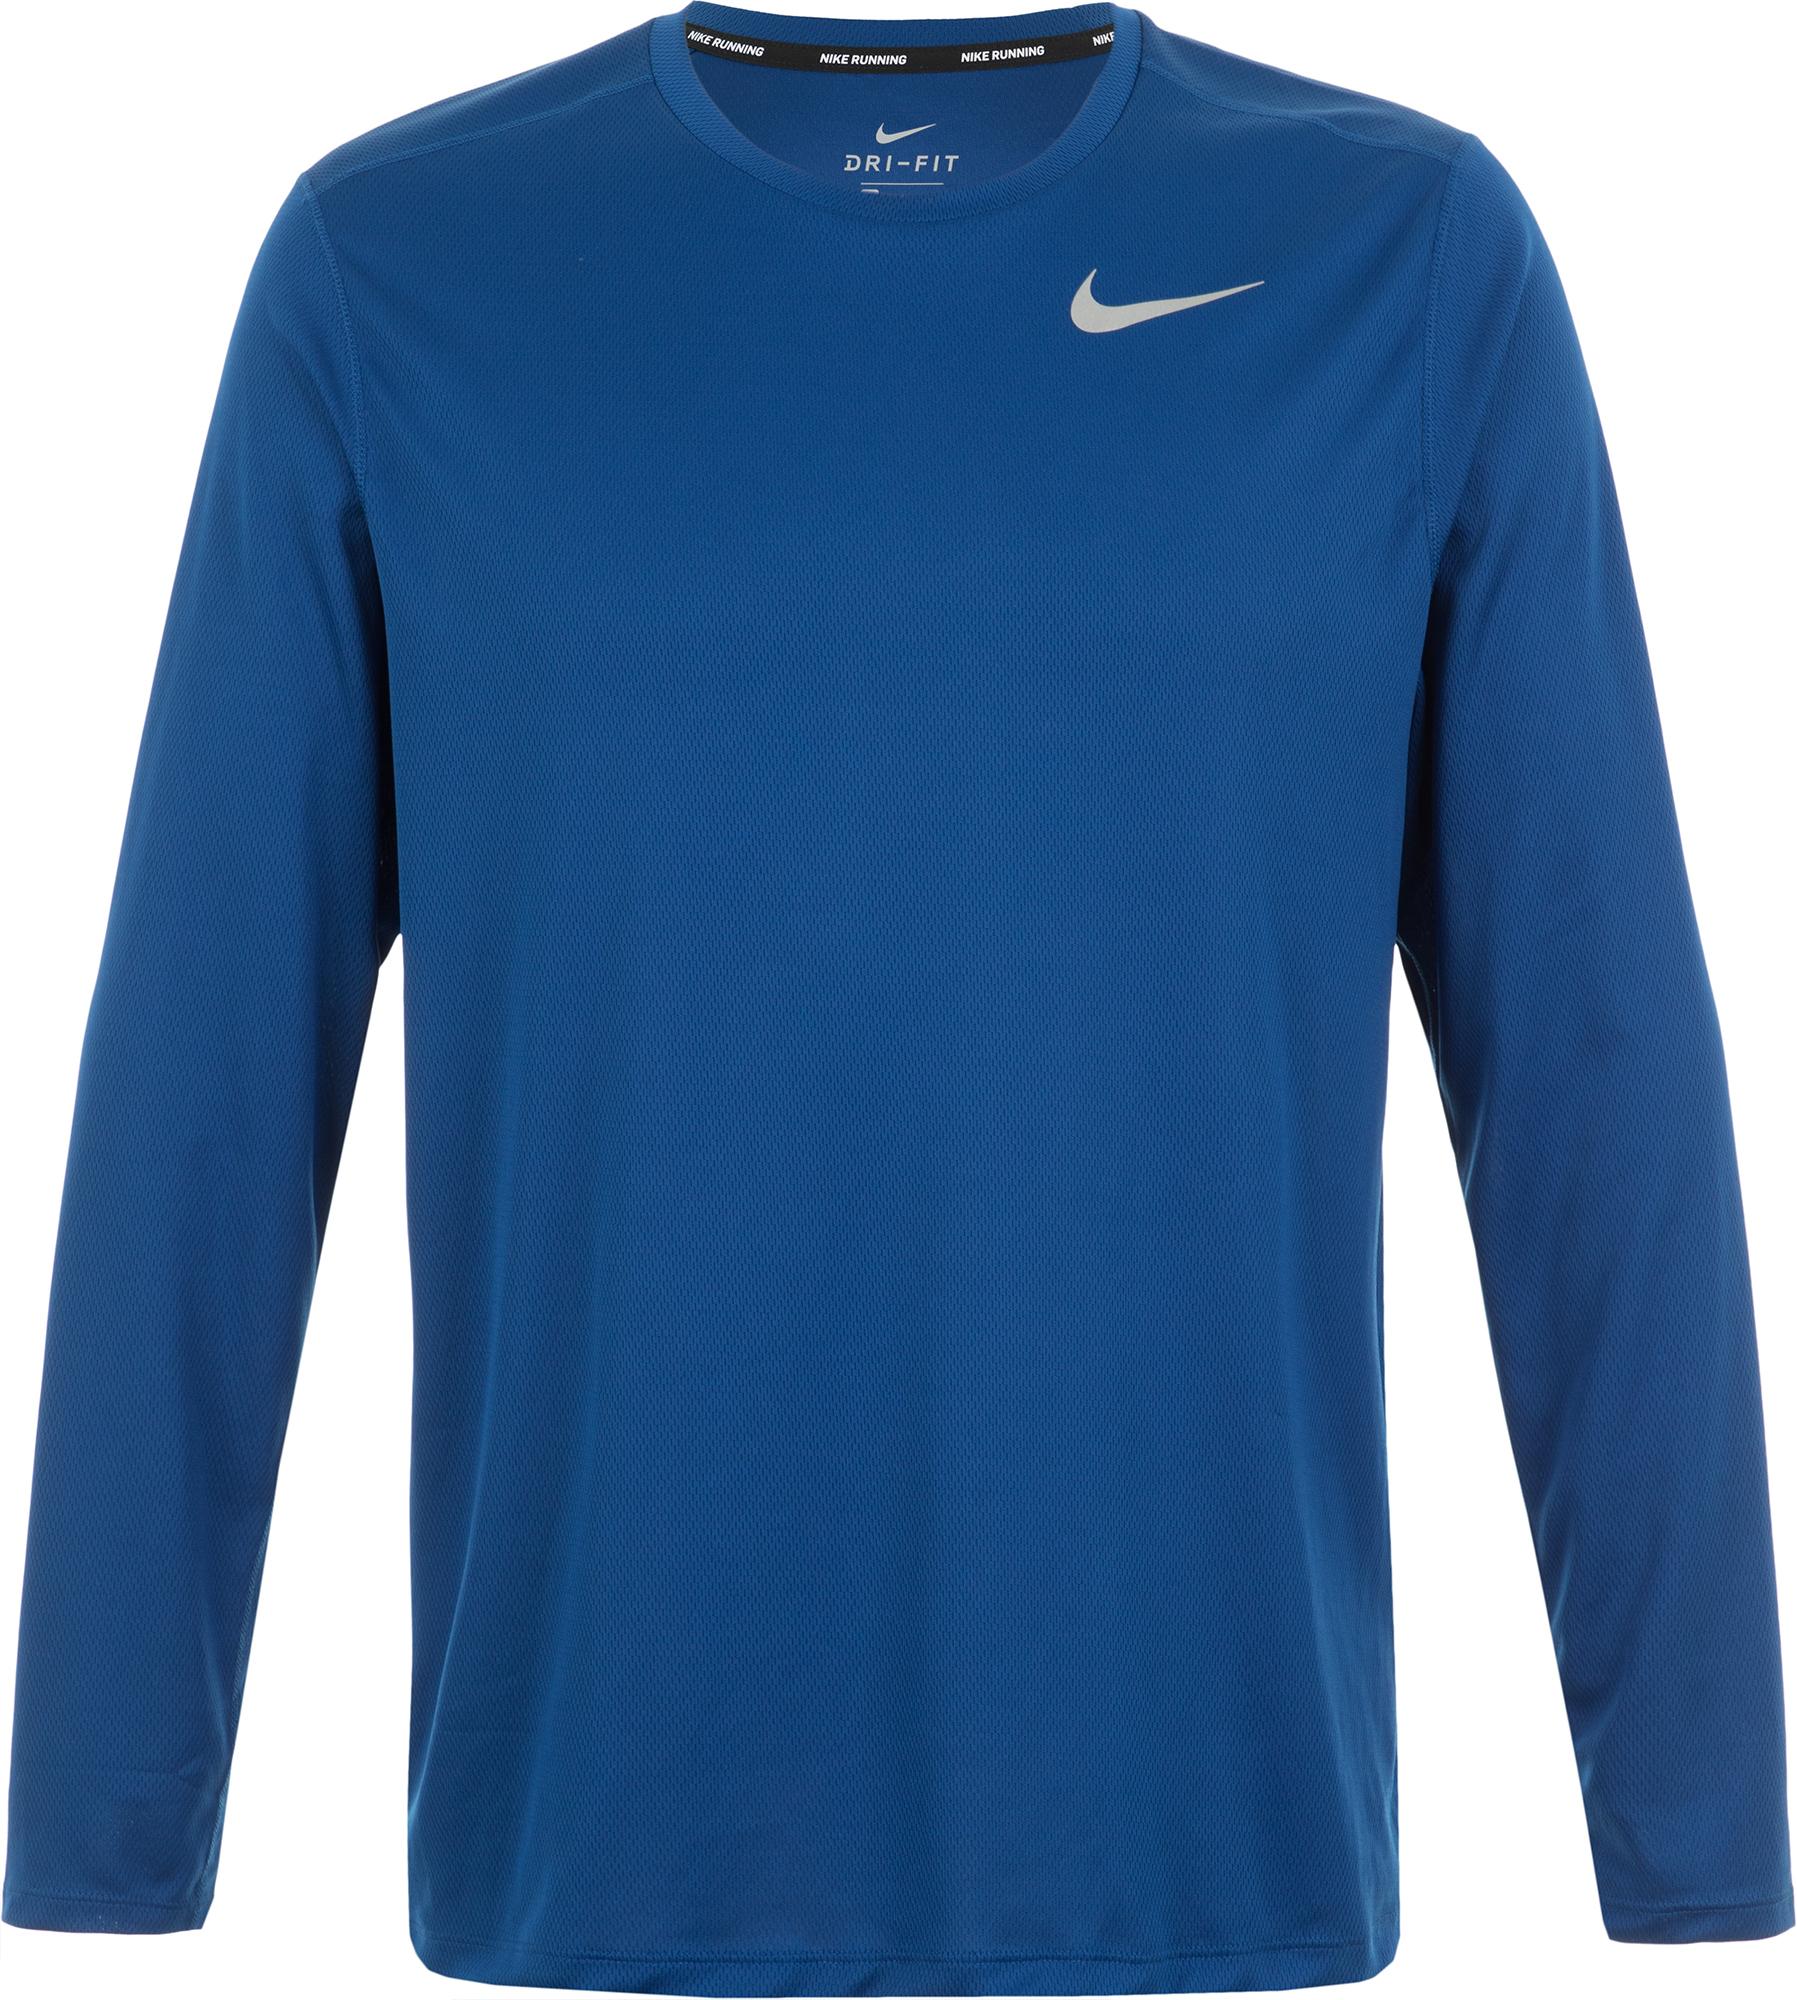 лонгслив мужской regatta karter цвет серый rmt171 038 размер l 52 54 Nike Лонгслив мужской Nike Breathe, размер 52-54